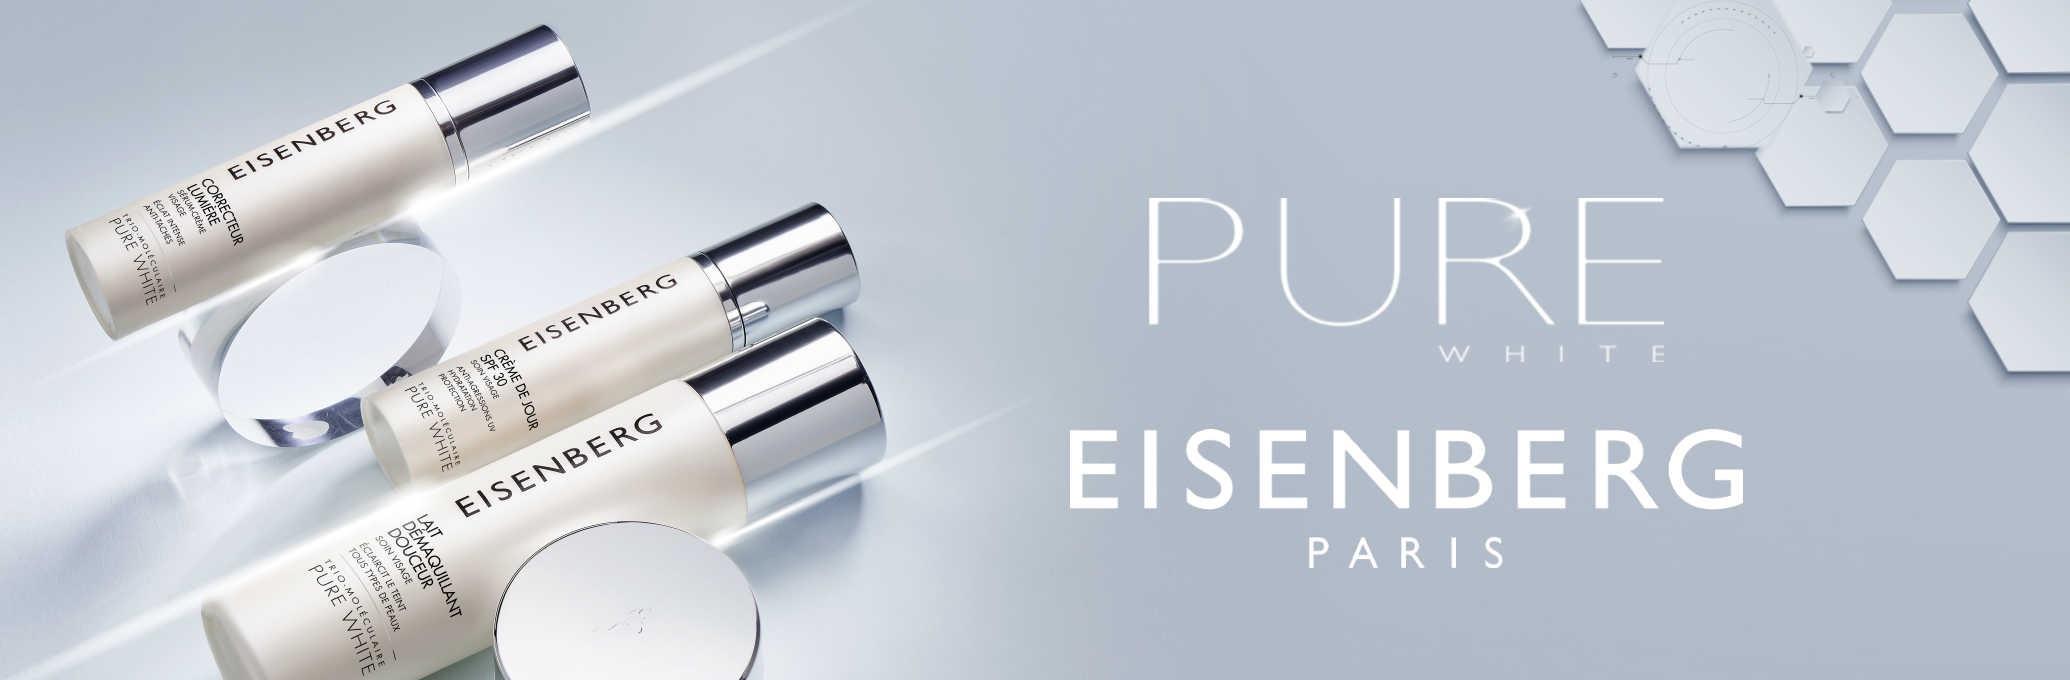 Eisenberg Pure White